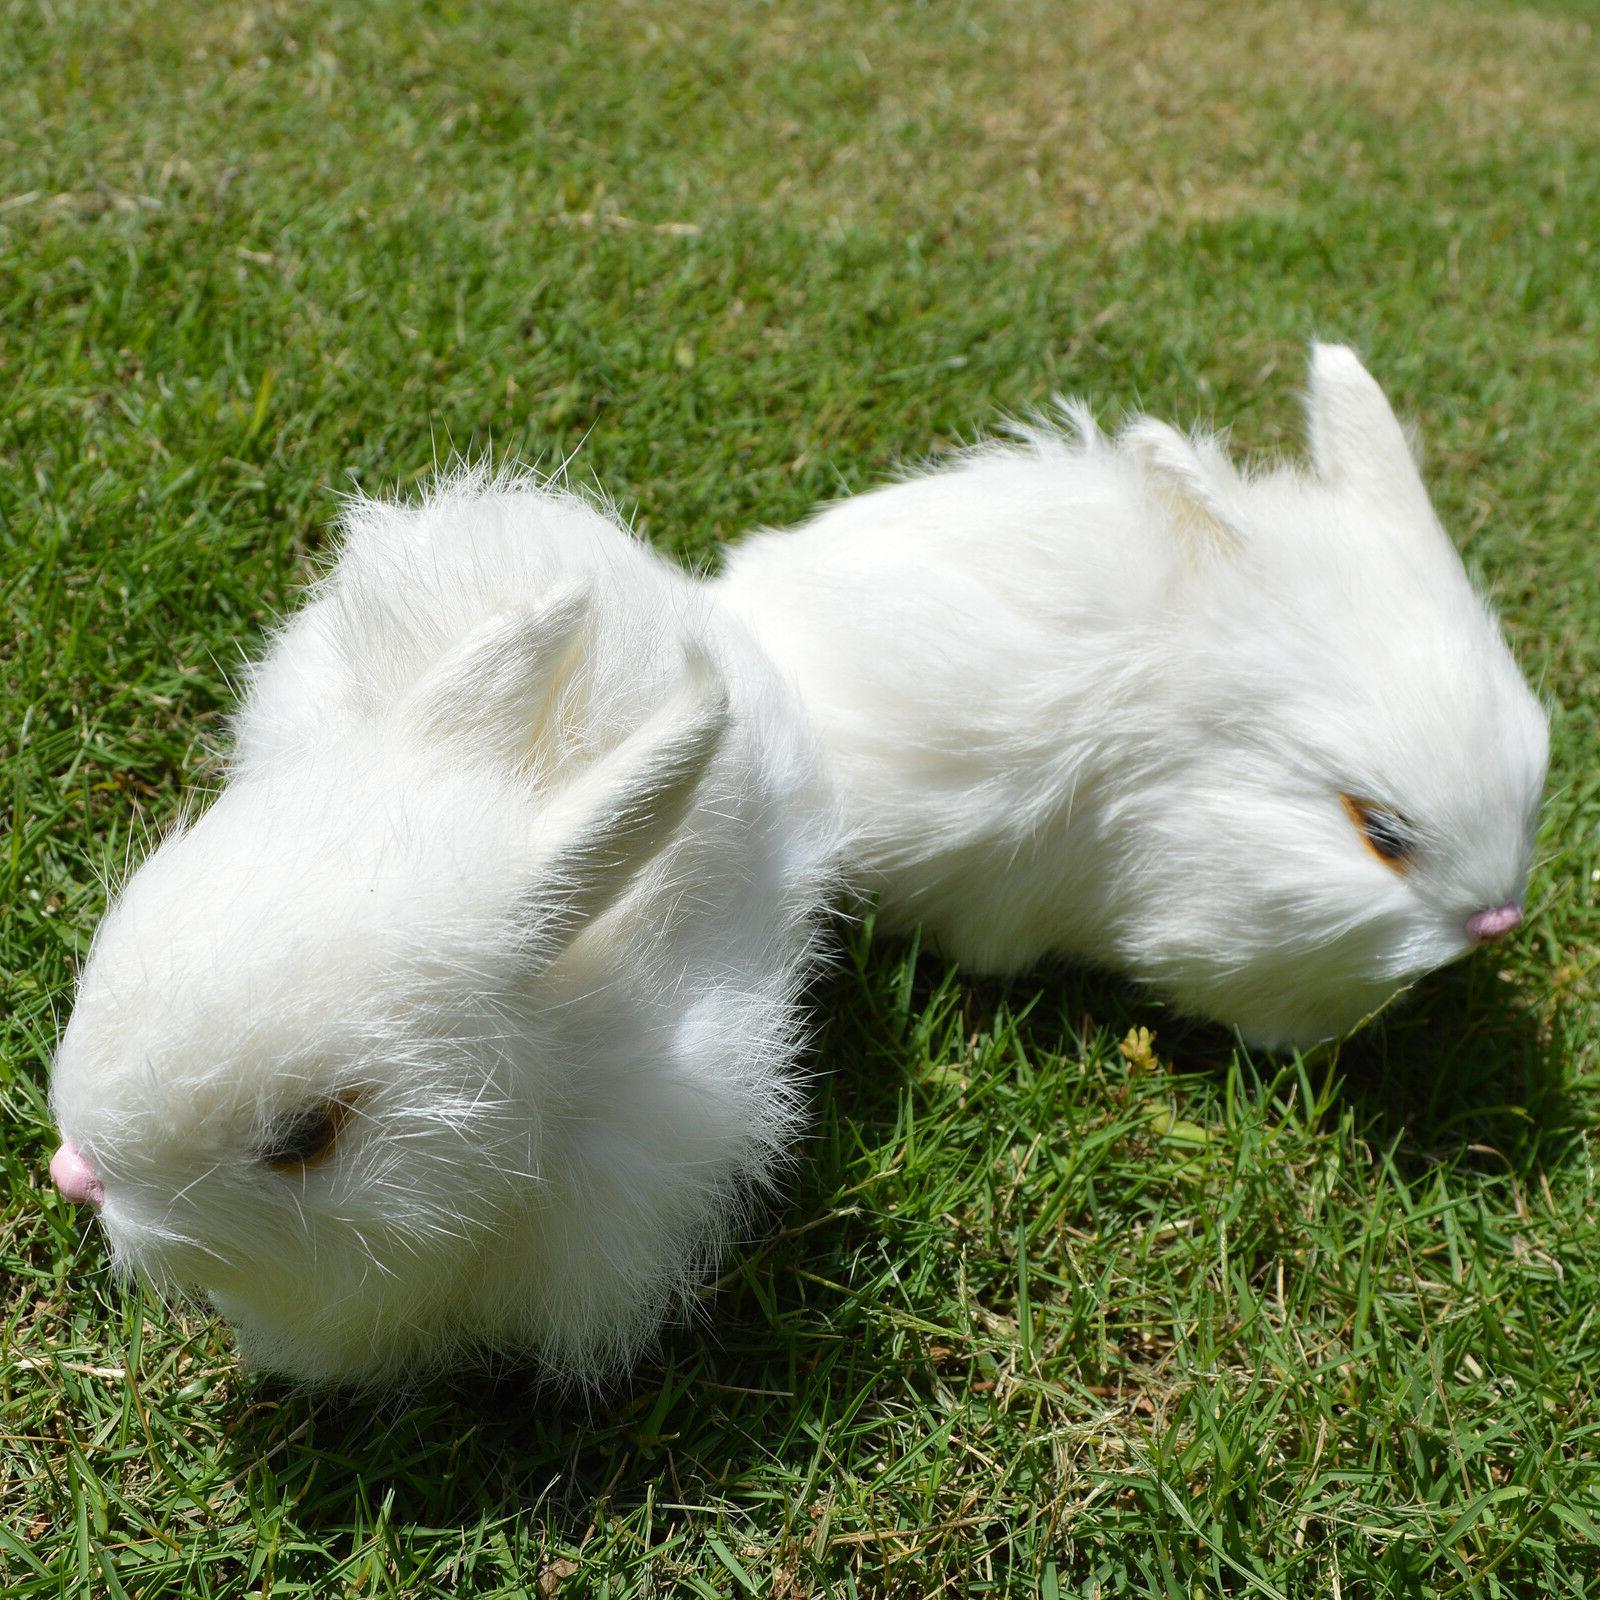 2 Realistic White Rabbits Fur Lifelike Furry Bunnies